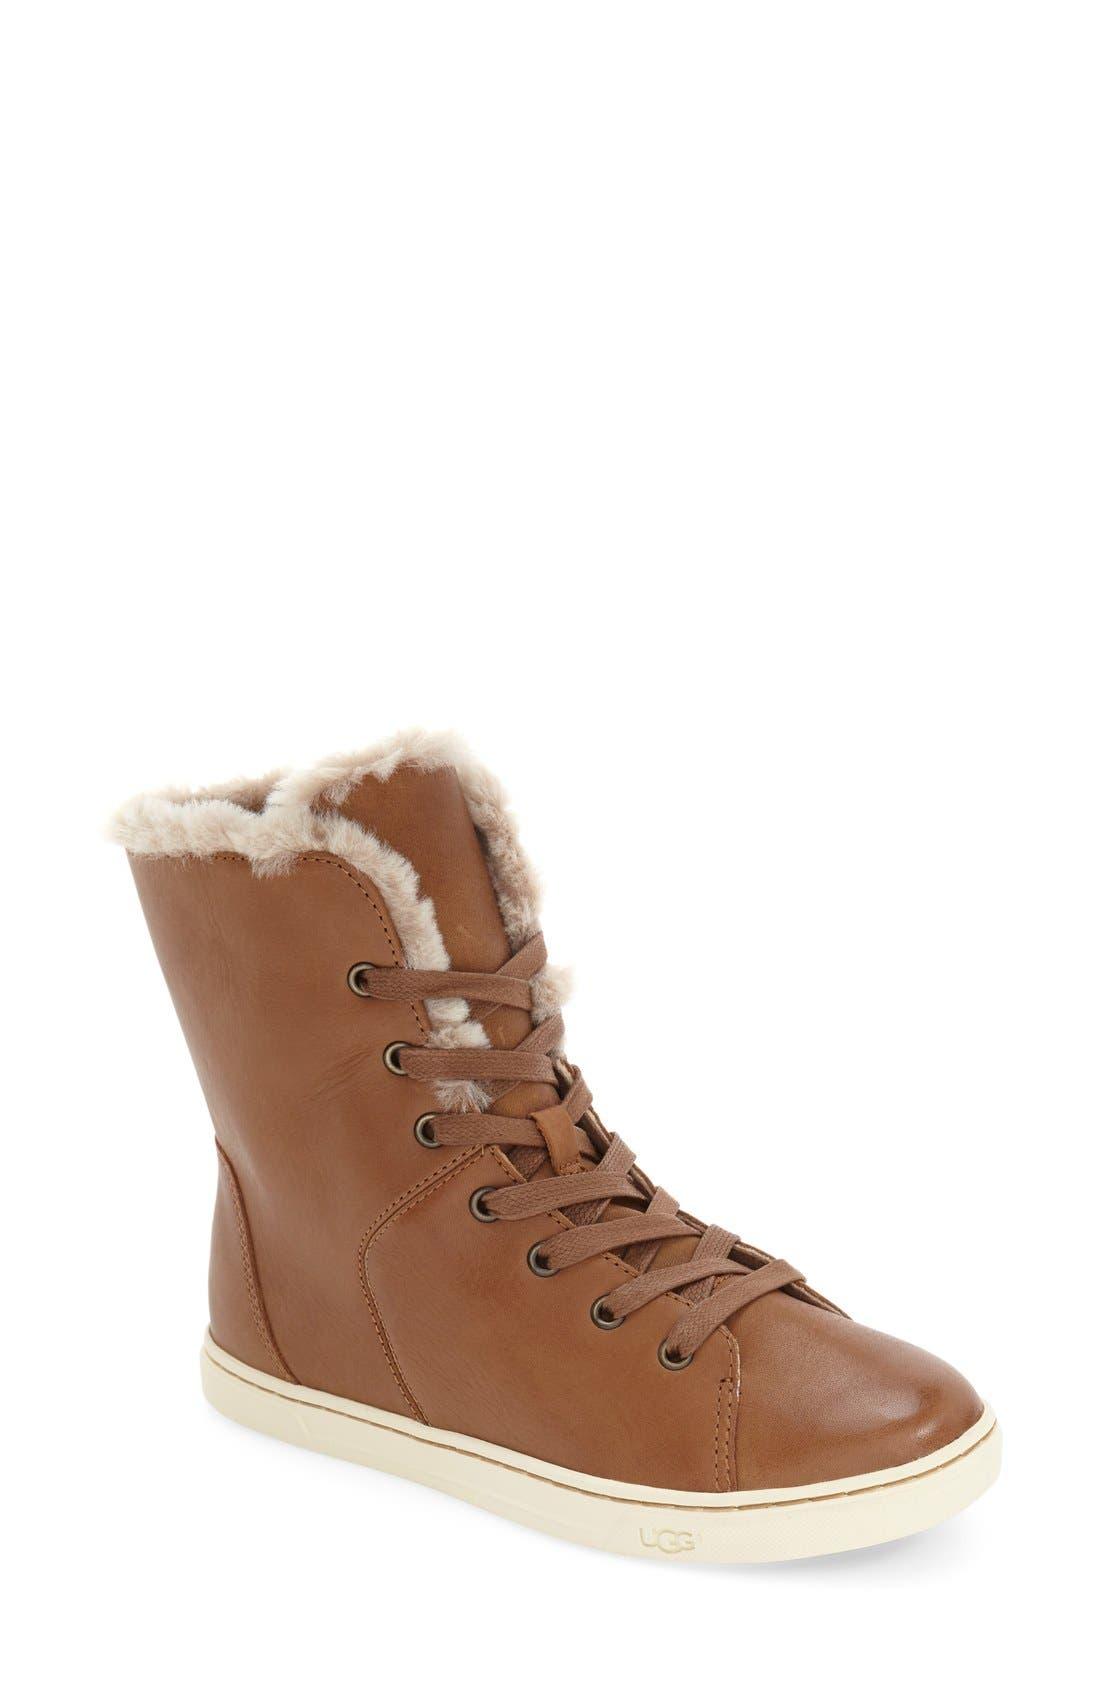 Main Image - UGG® 'Croft Luxe' Genuine Shearling High Top Sneaker (Women)